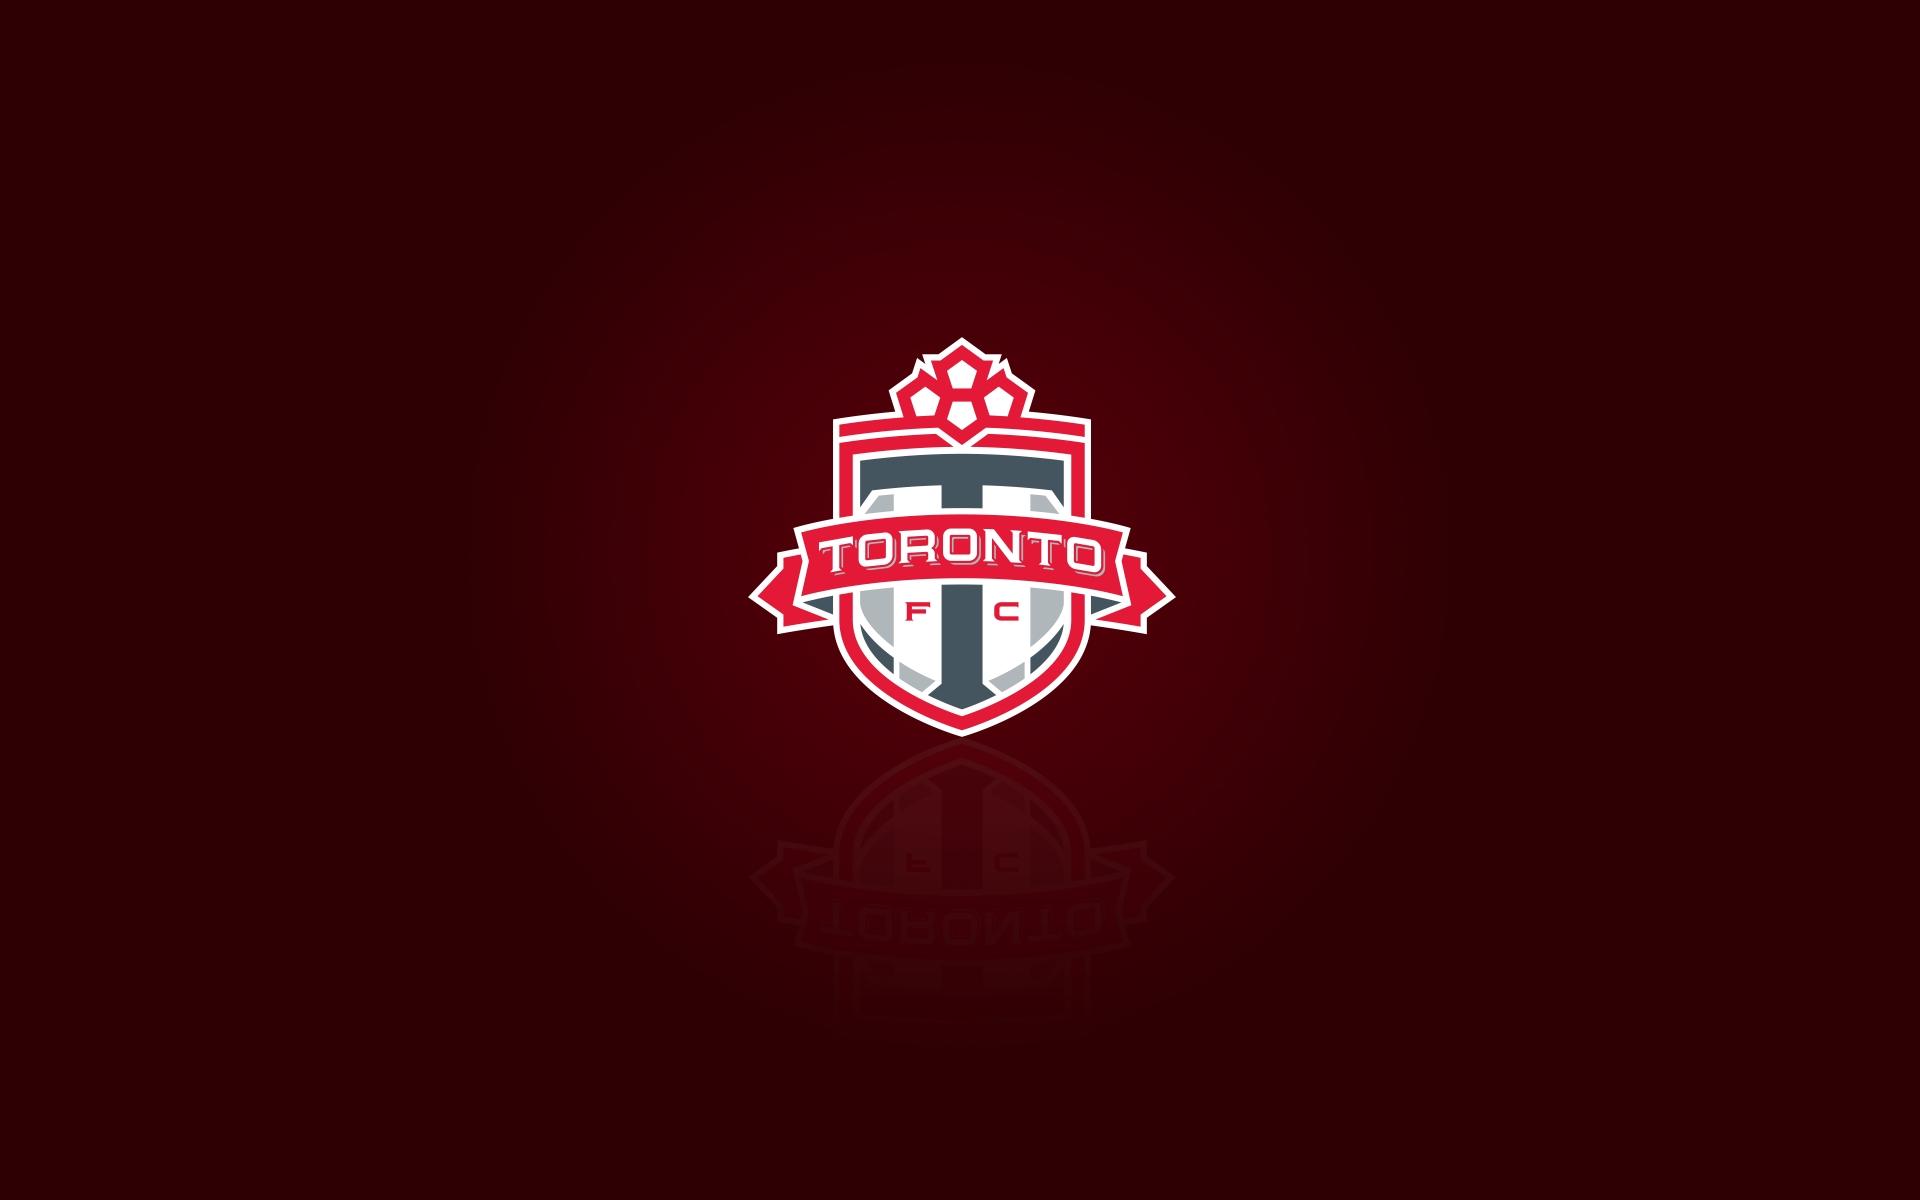 Toronto FC HD Wallpaper Background Image 1920x1200 ID988804 1920x1200